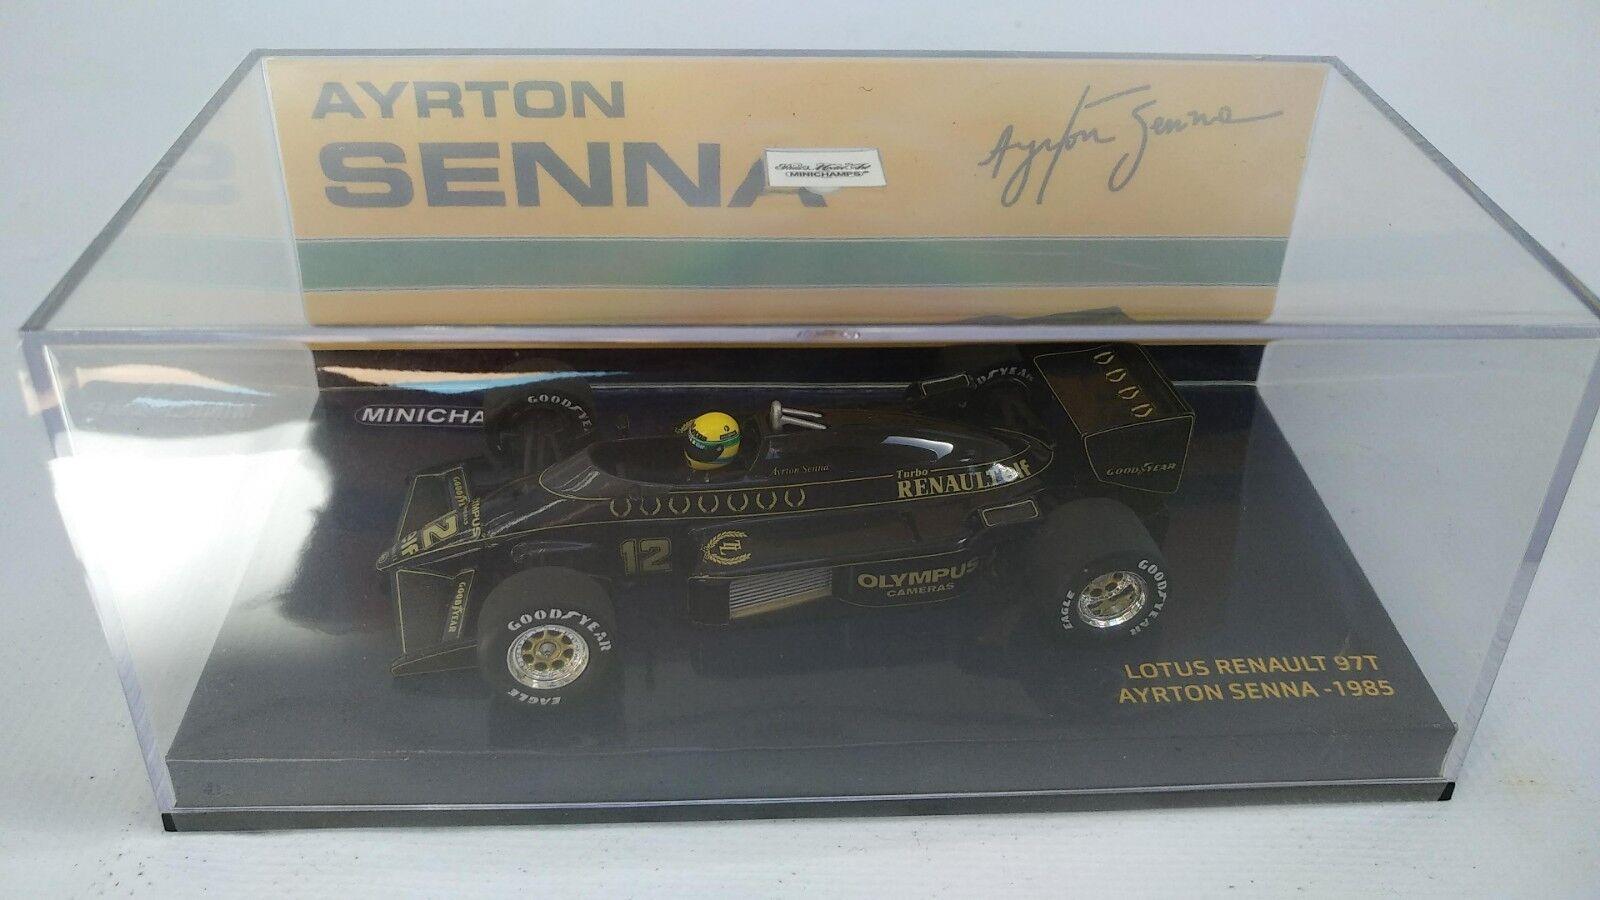 MINICHAMPS 1 43 LOTUS RENAULT 97 T Turbo 1985 Ayrton Senna Diecast voiture jouet F1